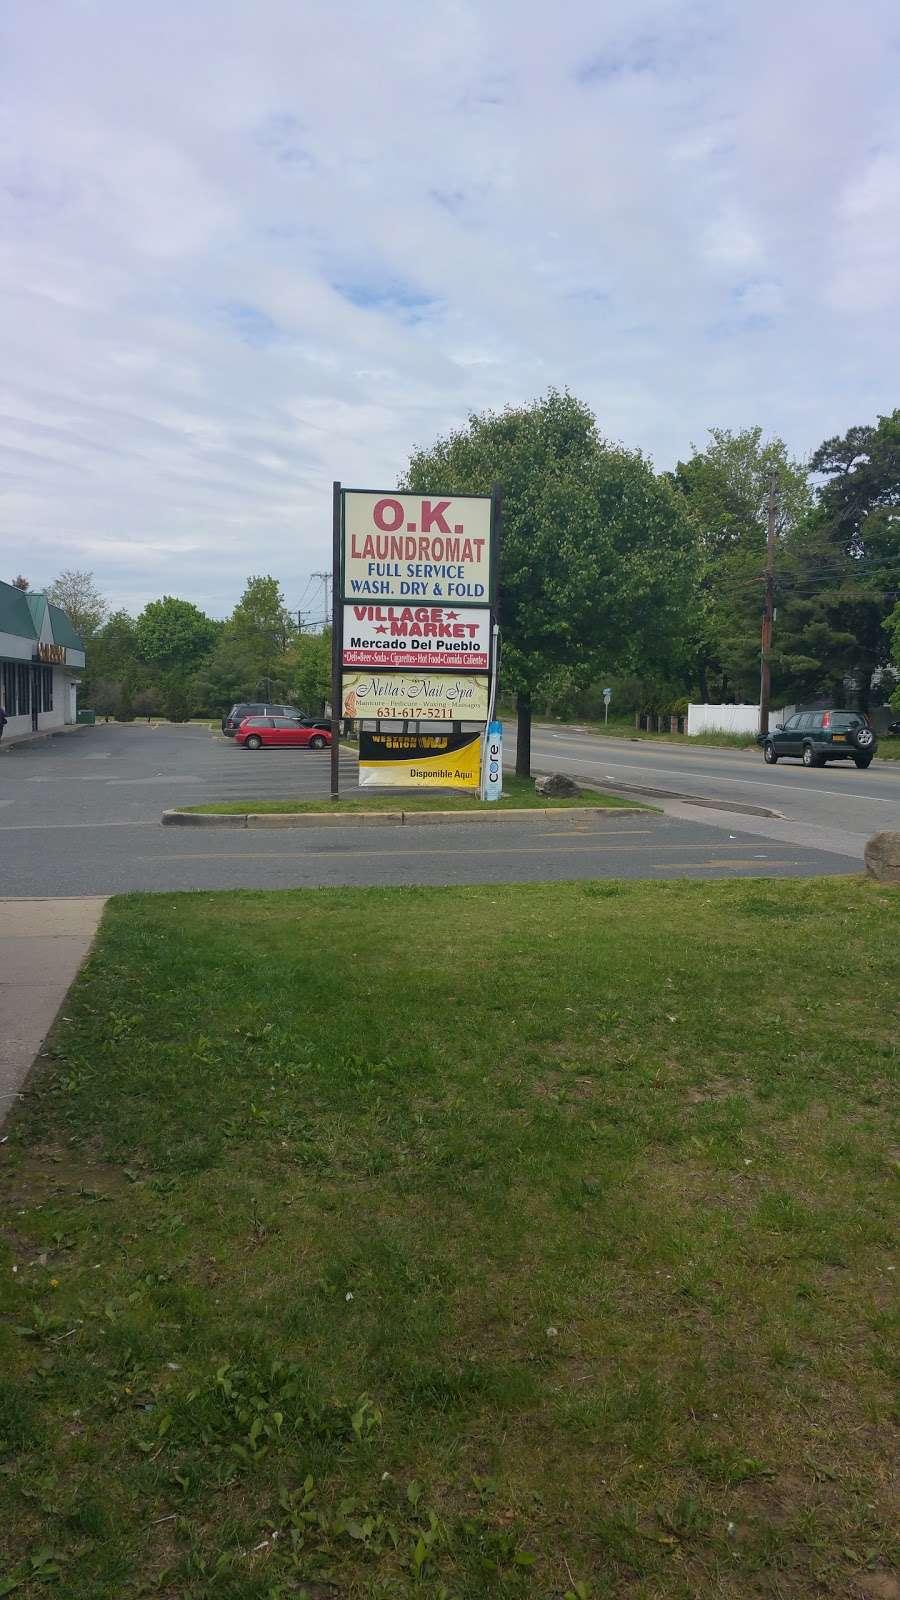 The Village Market - restaurant  | Photo 3 of 3 | Address: 920 Suffolk Ave, Brentwood, NY 11717, USA | Phone: (631) 434-1700